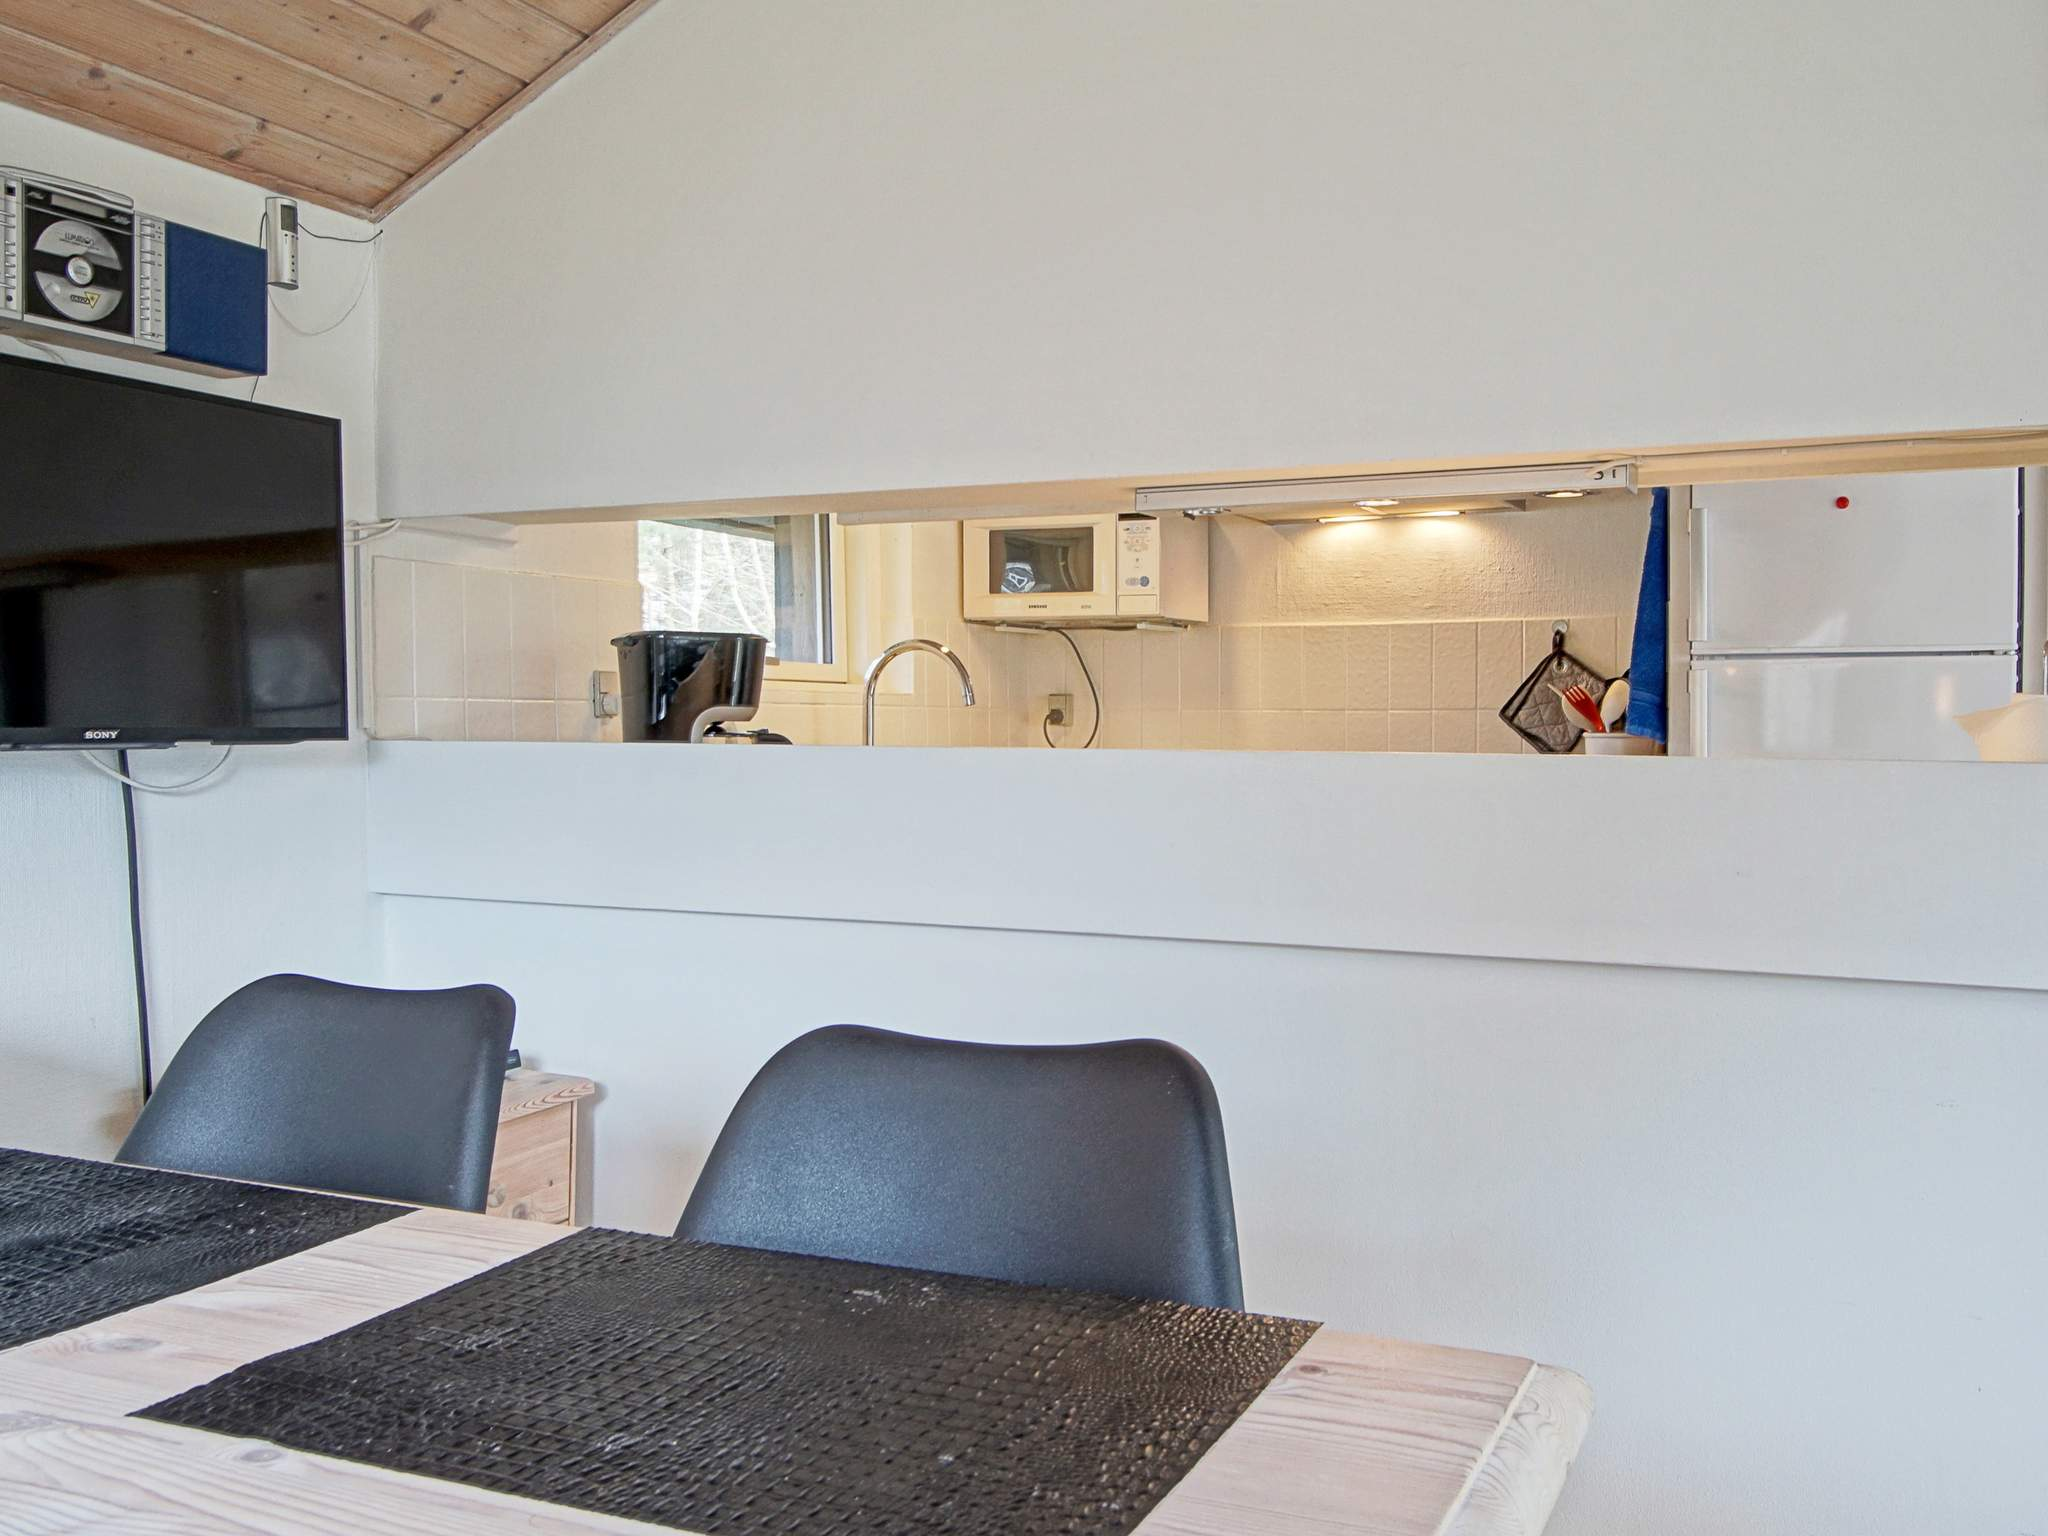 Ferienhaus Balka Strand (82287), Balke, , Bornholm, Dänemark, Bild 7